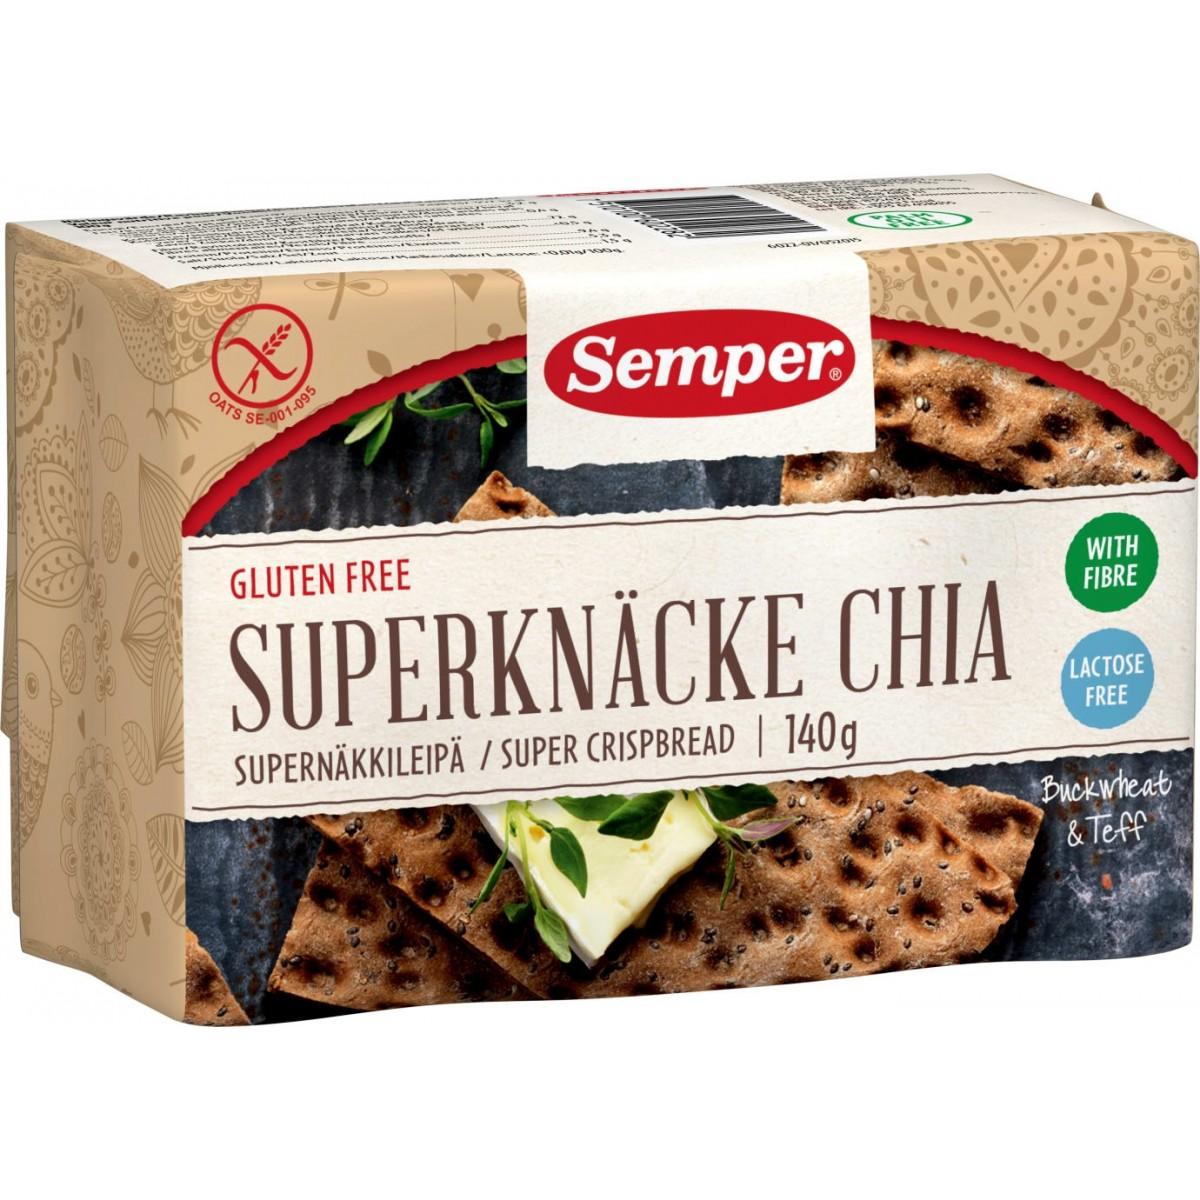 Superknackbrod Chia